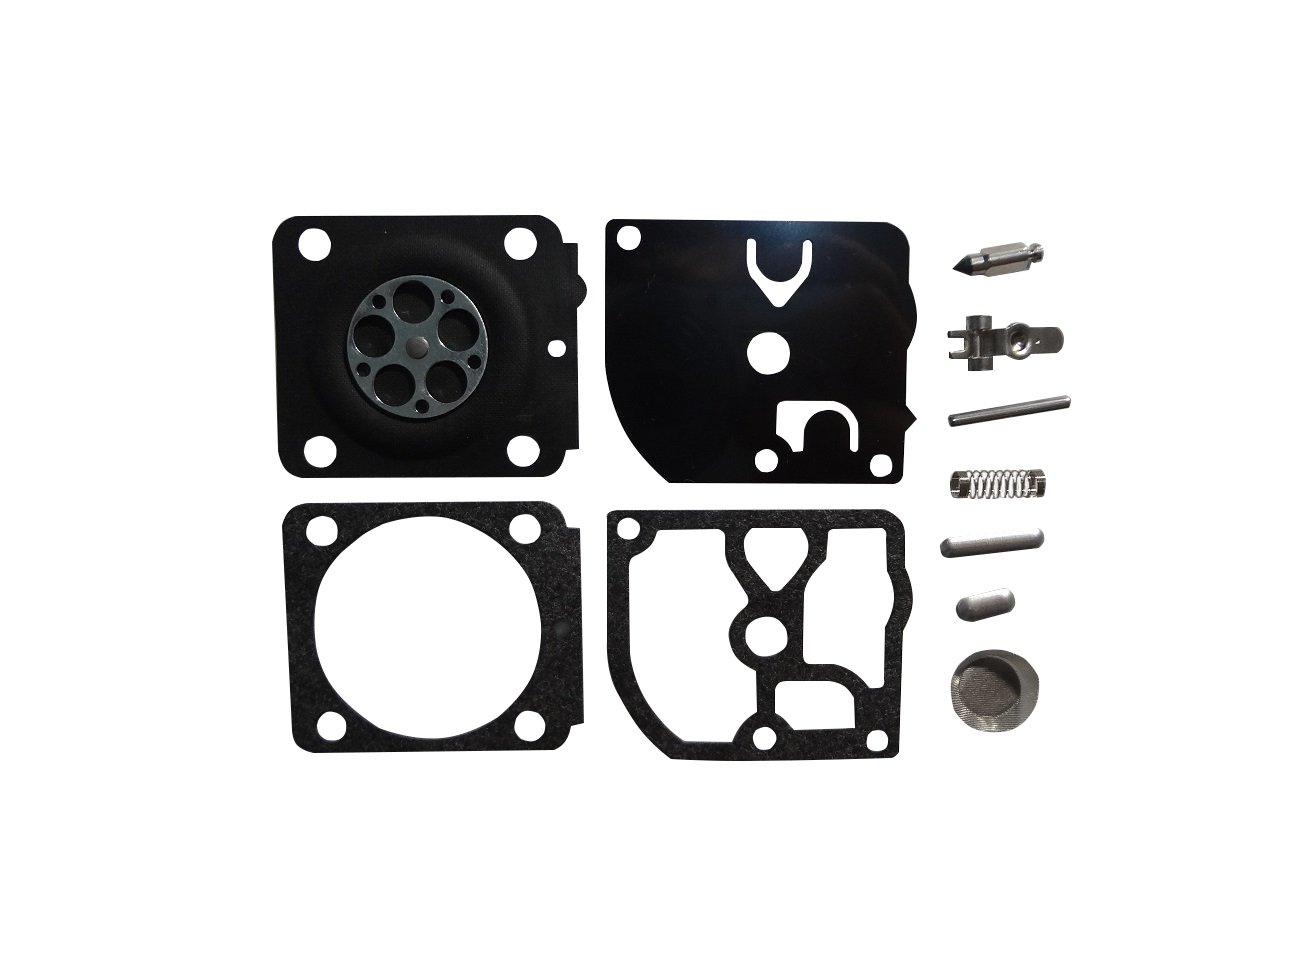 Carburetor Repair/Rebuild Kit Replaces Zama RB-161 for Stihl HS45 FS310 FS55 Trimmer Zama C1Q Carburetor CTS